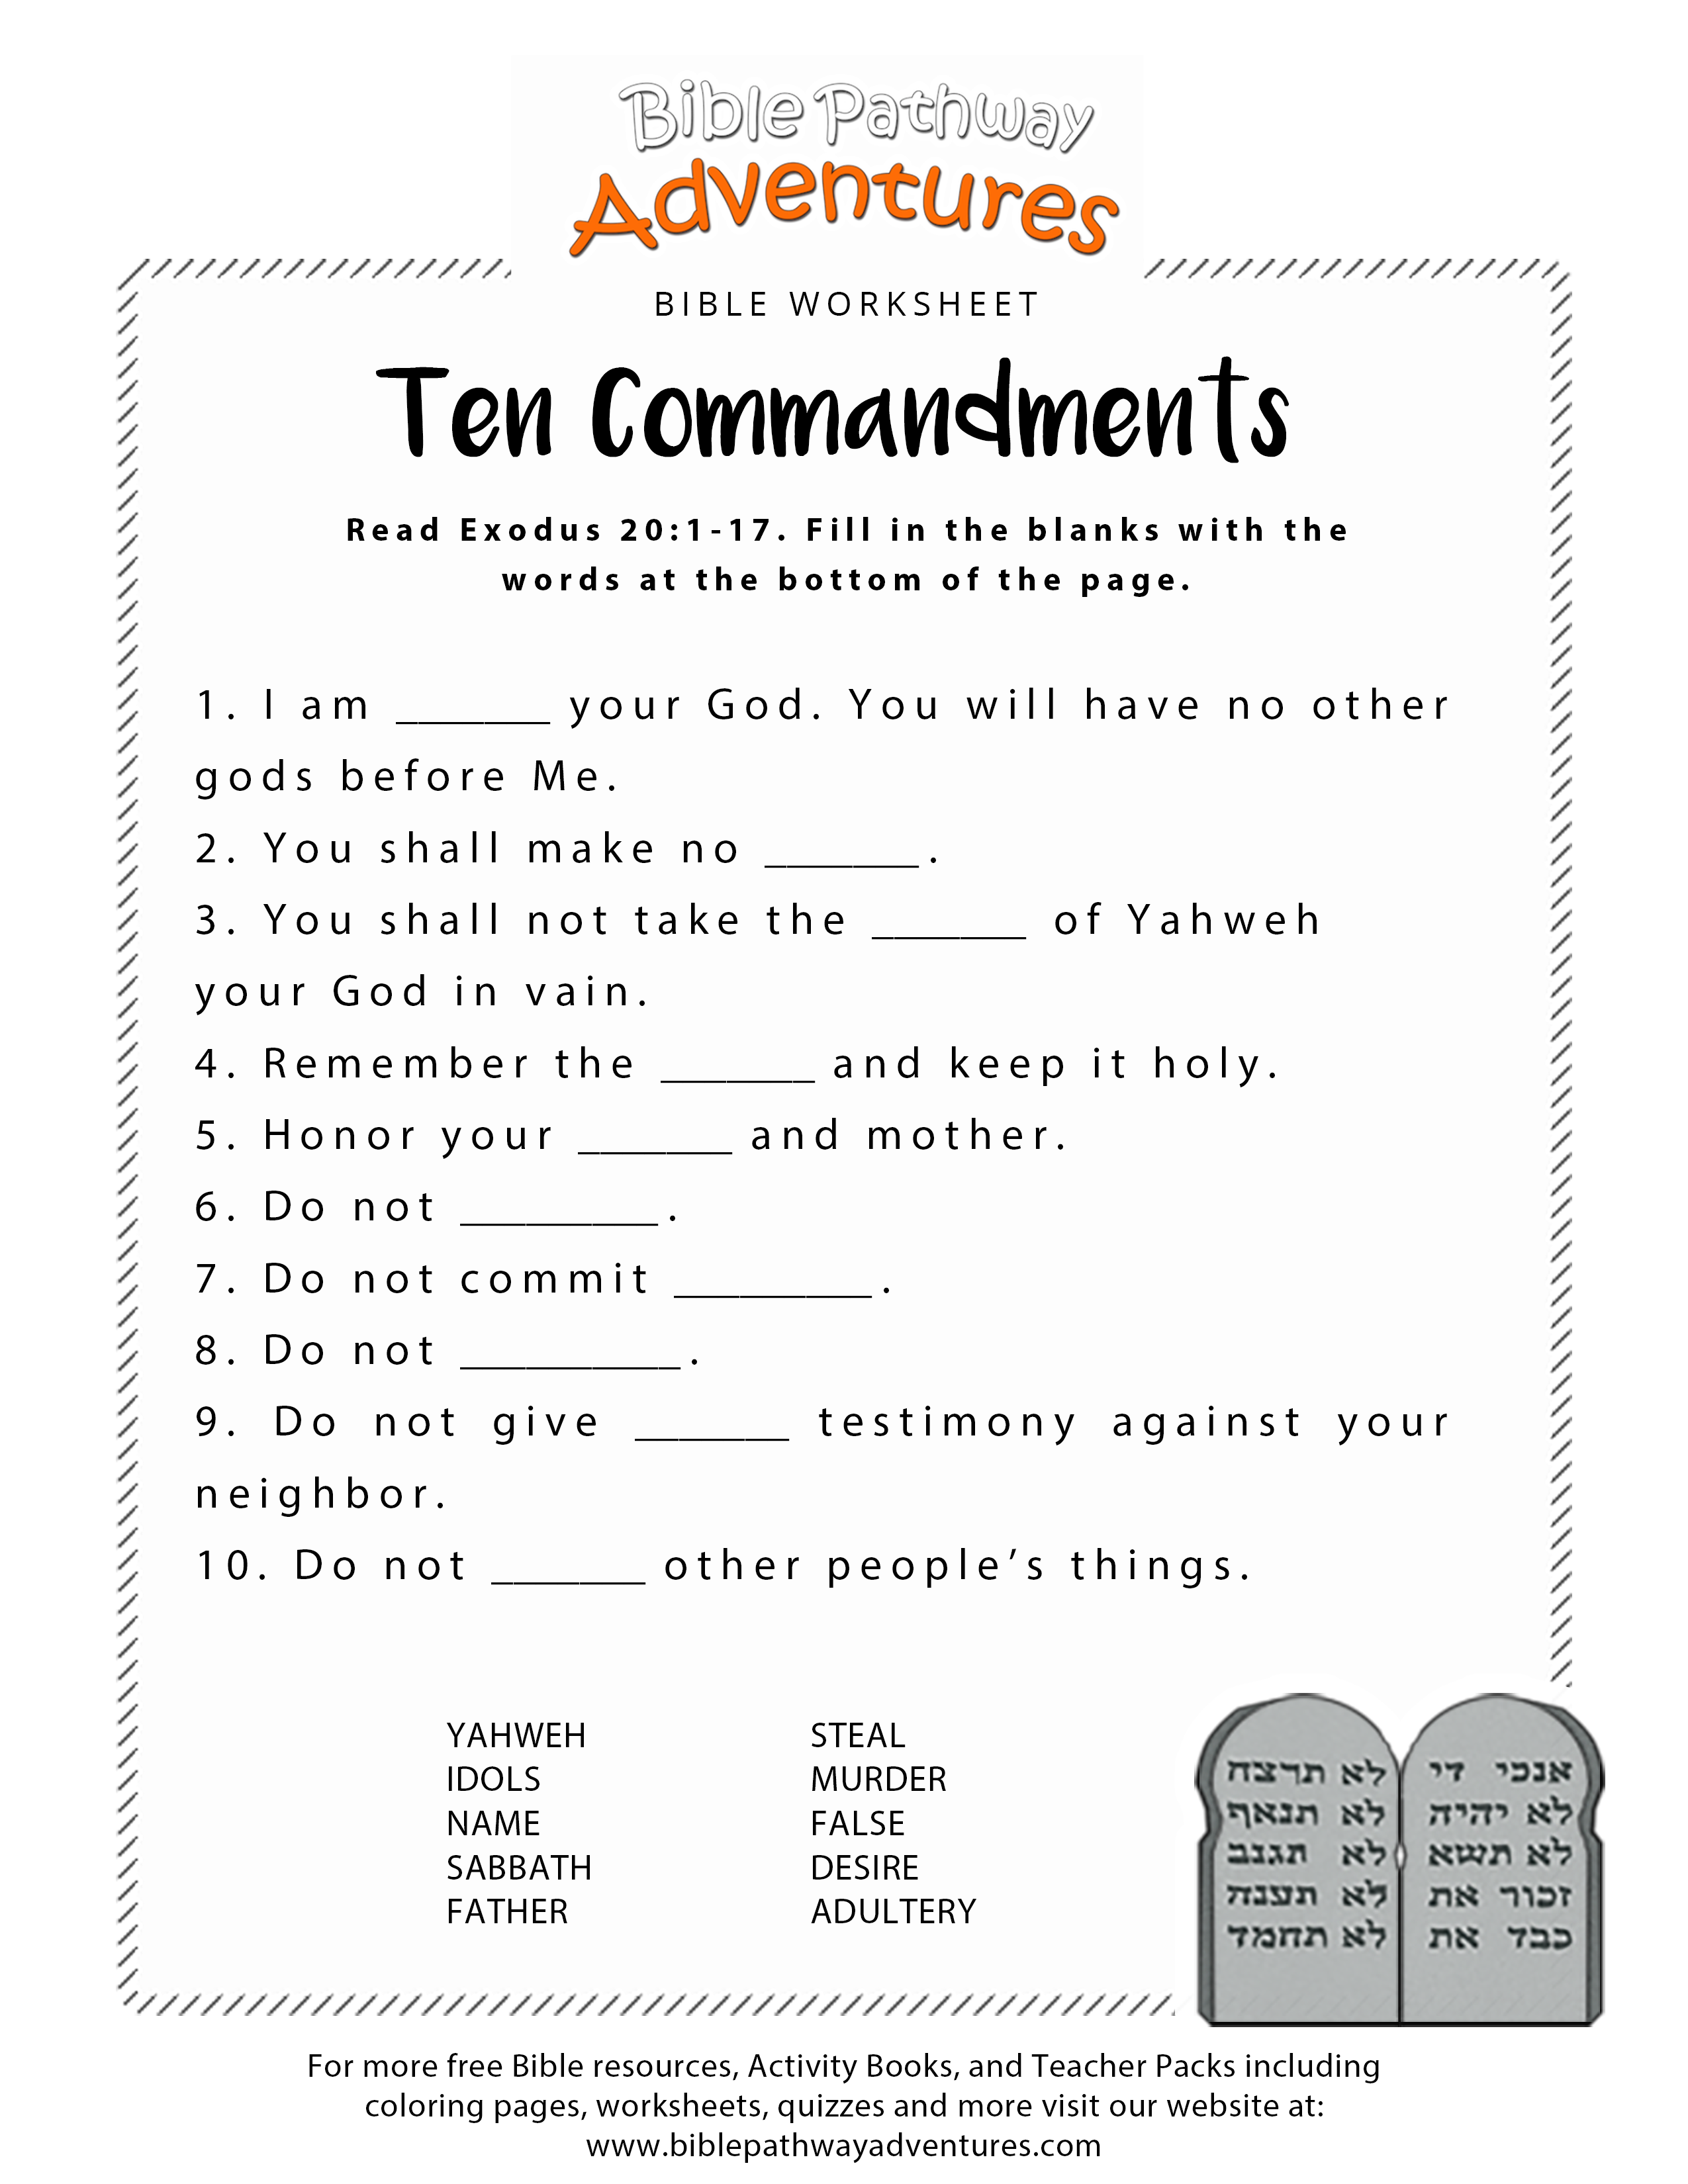 Ten Commandments Worksheet For Kids Free Printable Bible